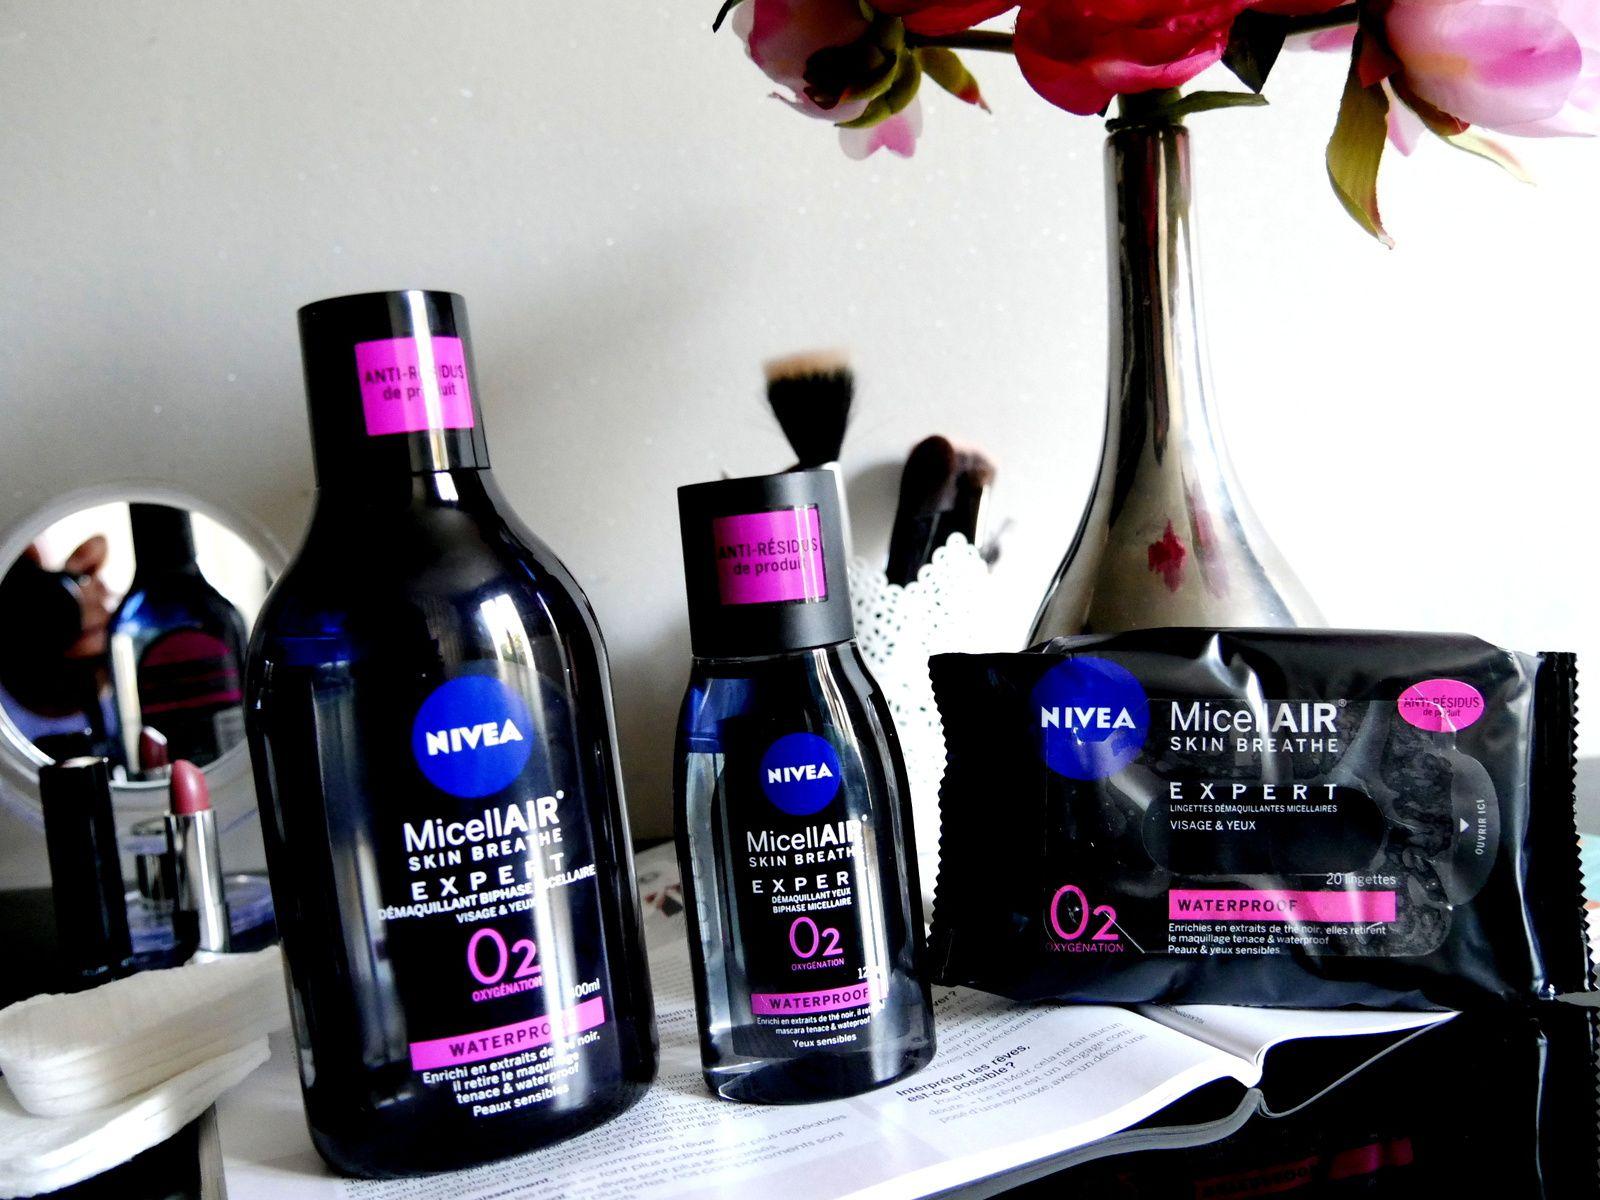 Micellair Black expert de Nivea : RIP le maquillage